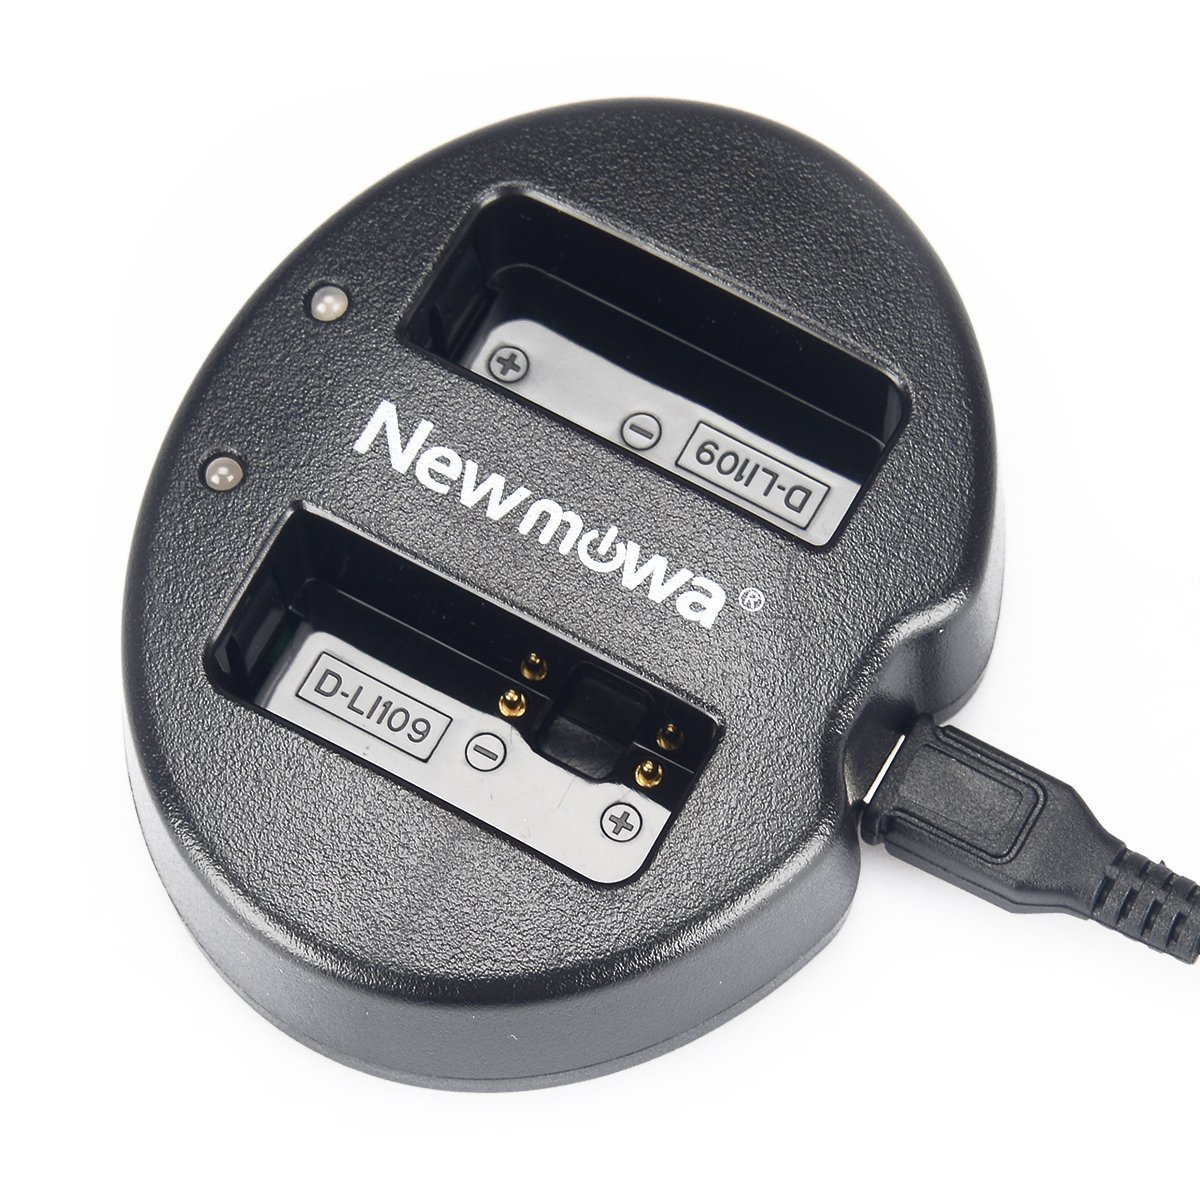 Newmowa Dual USB Charger for Pentax D-Li109 and Pentax K-R K-30 K-50 K-500 K-S1 K-S2 by Newmowa